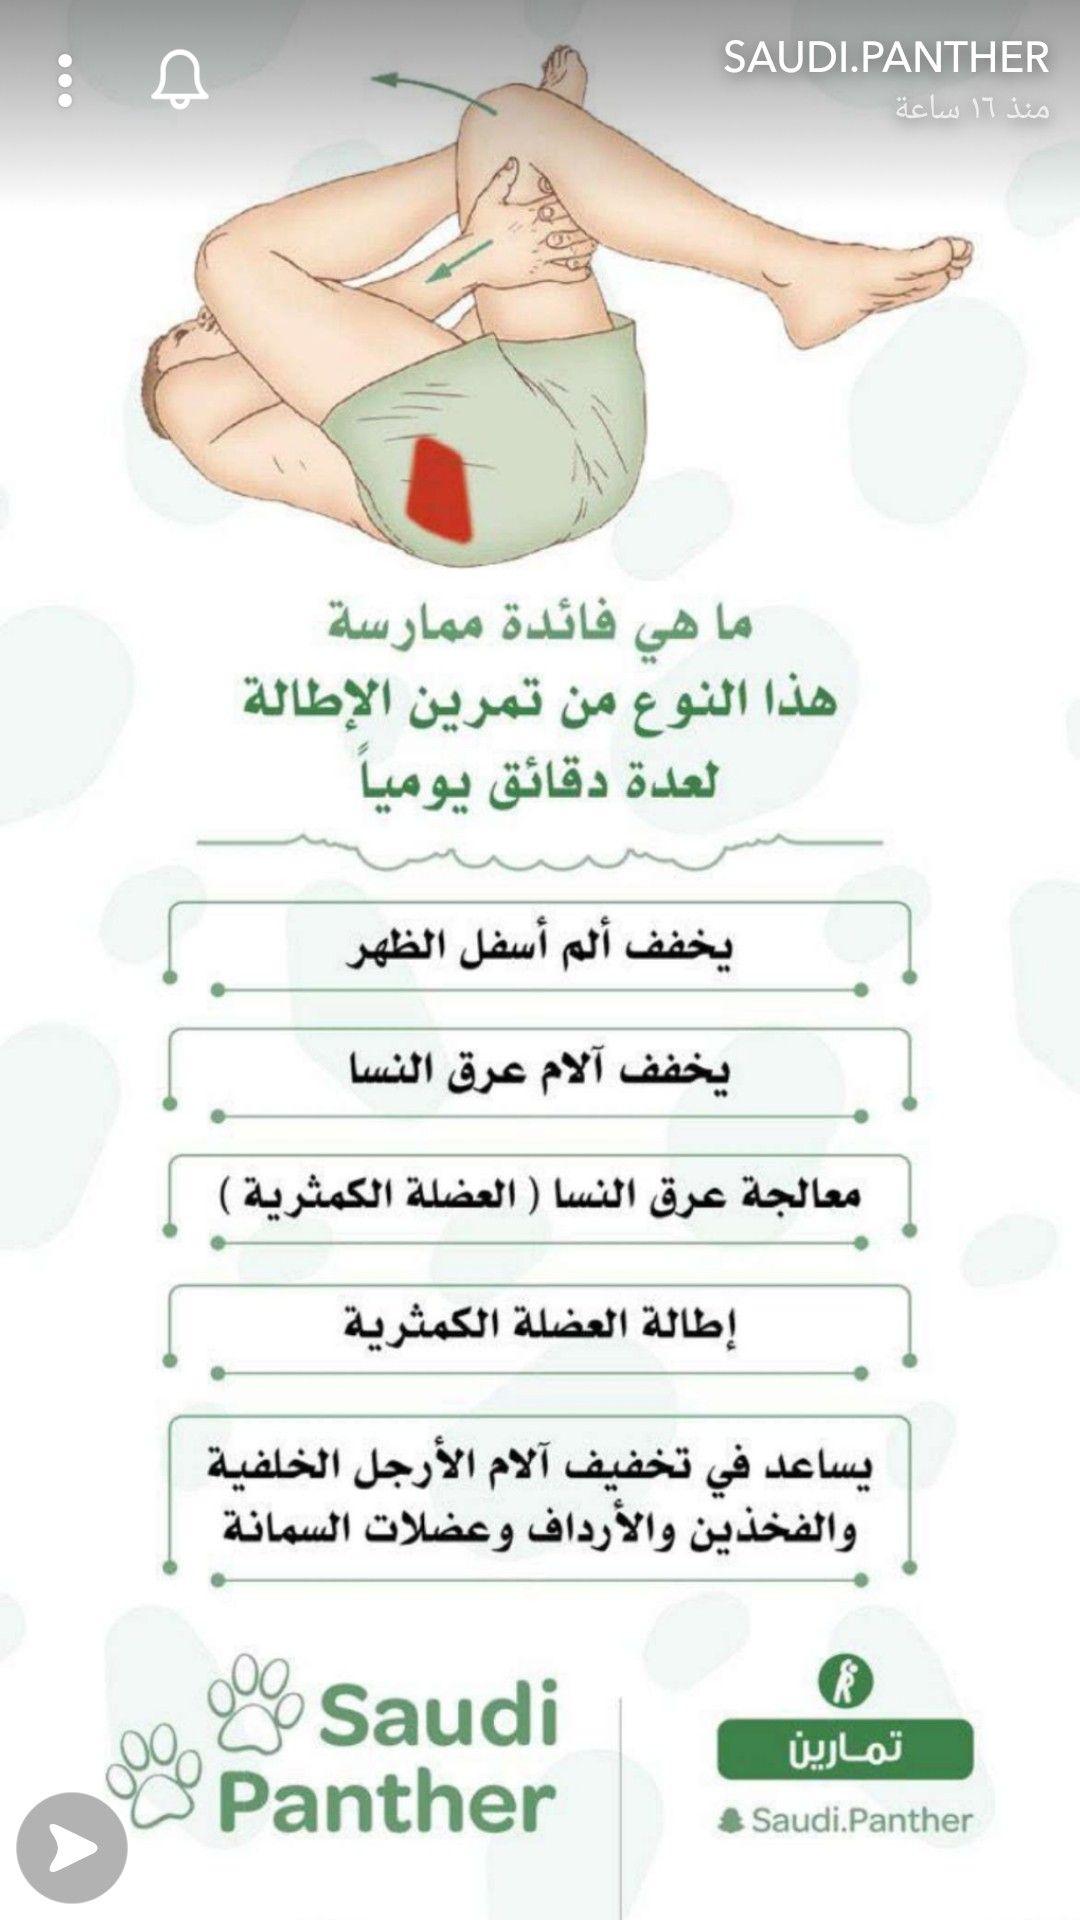 Pin By Dalal Abbas On العناية بالبشرة Full Body Gym Workout Fitness Motivation Videos Gym Workout Plan For Women